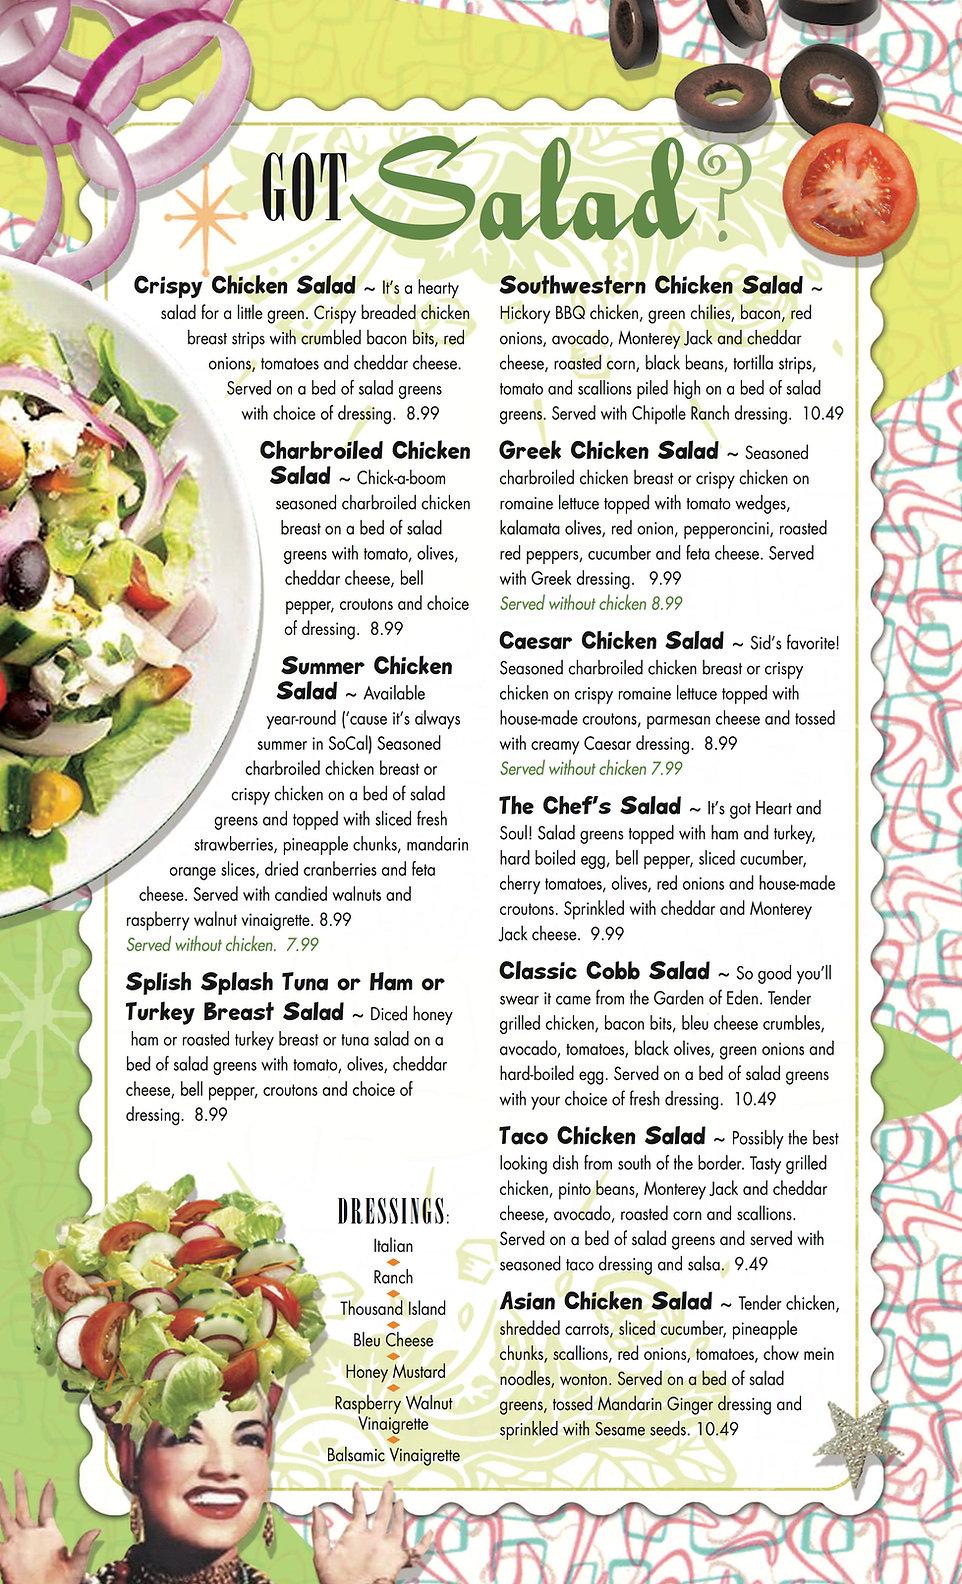 Got Salad.jpg